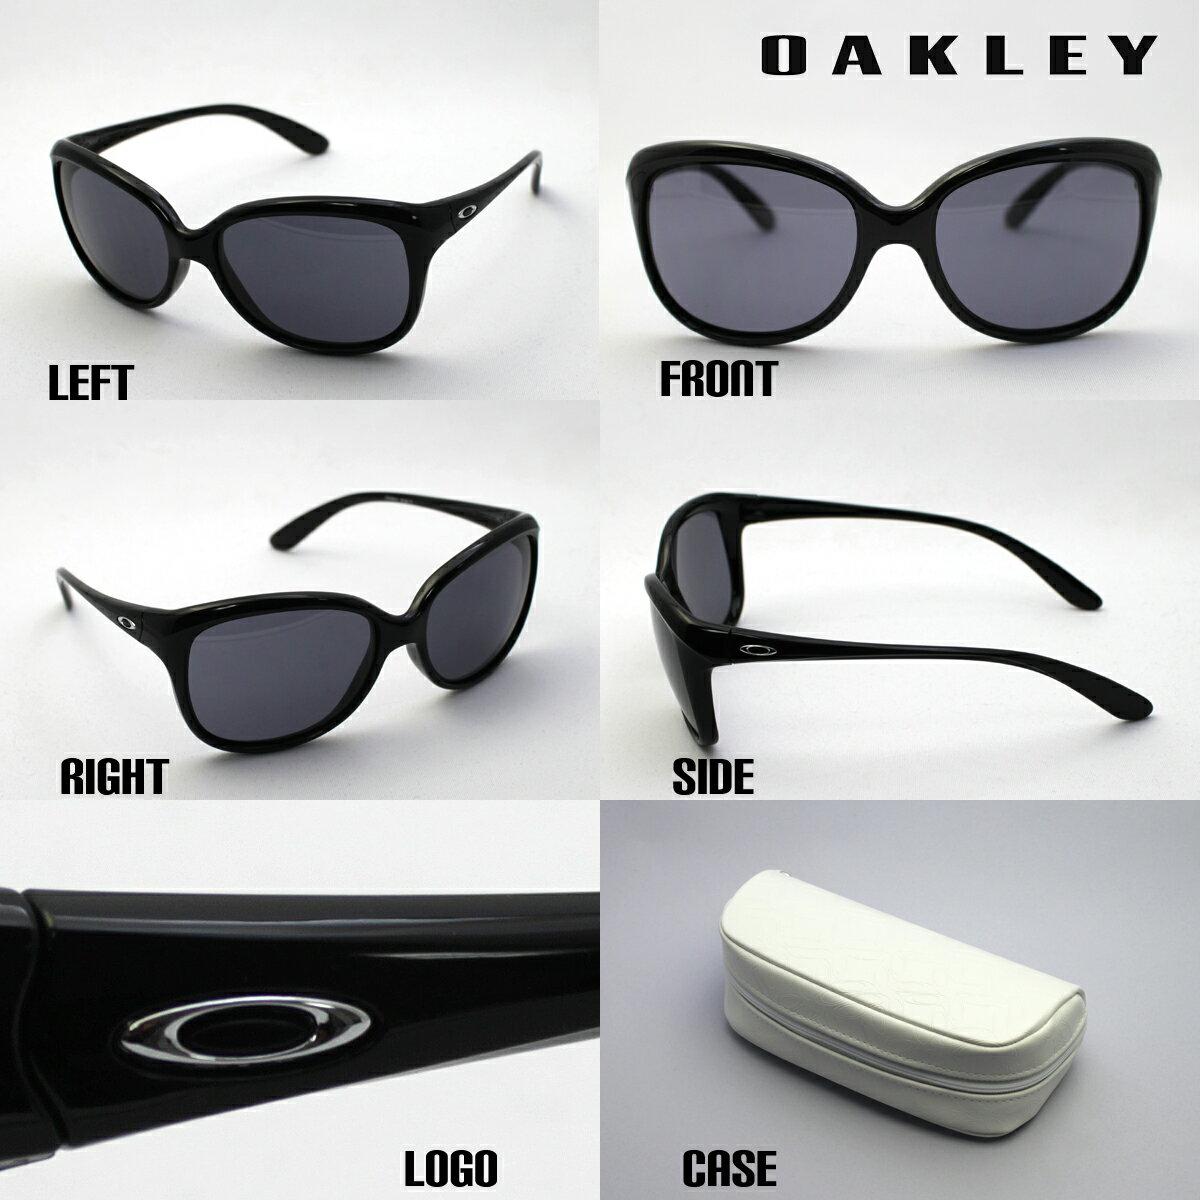 Oakley Glasses New Zealand